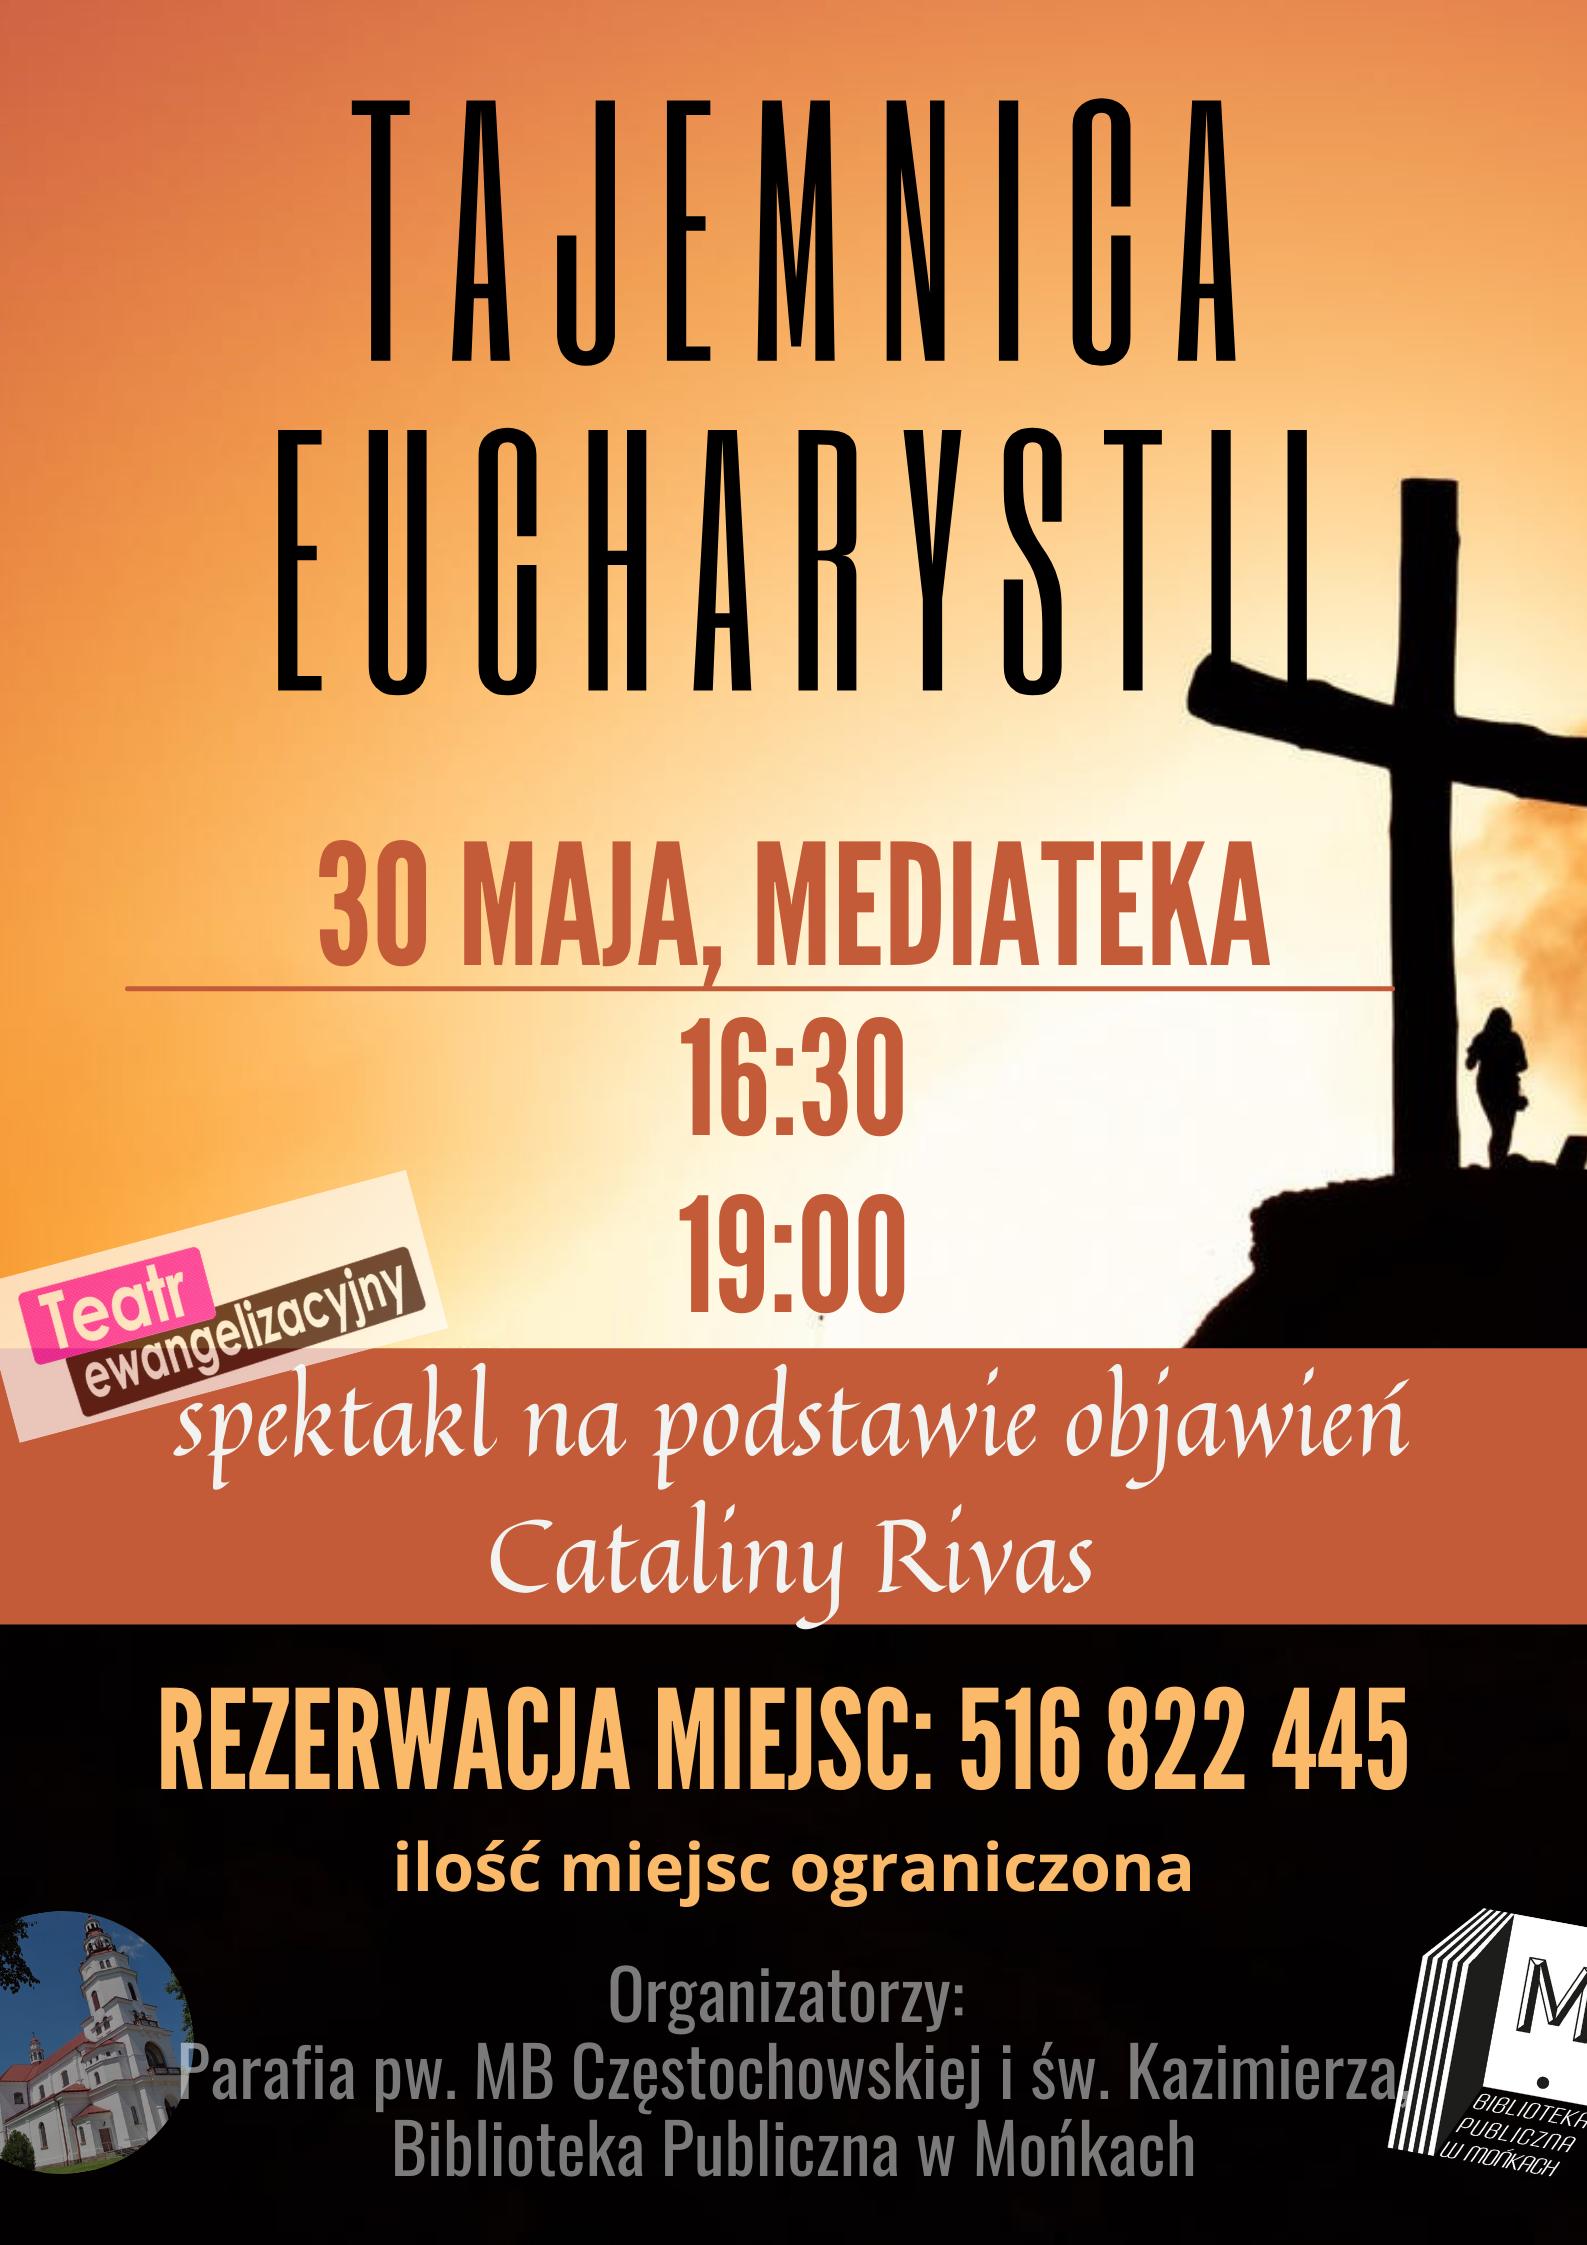 Plakat Tajemnica Eucharystii